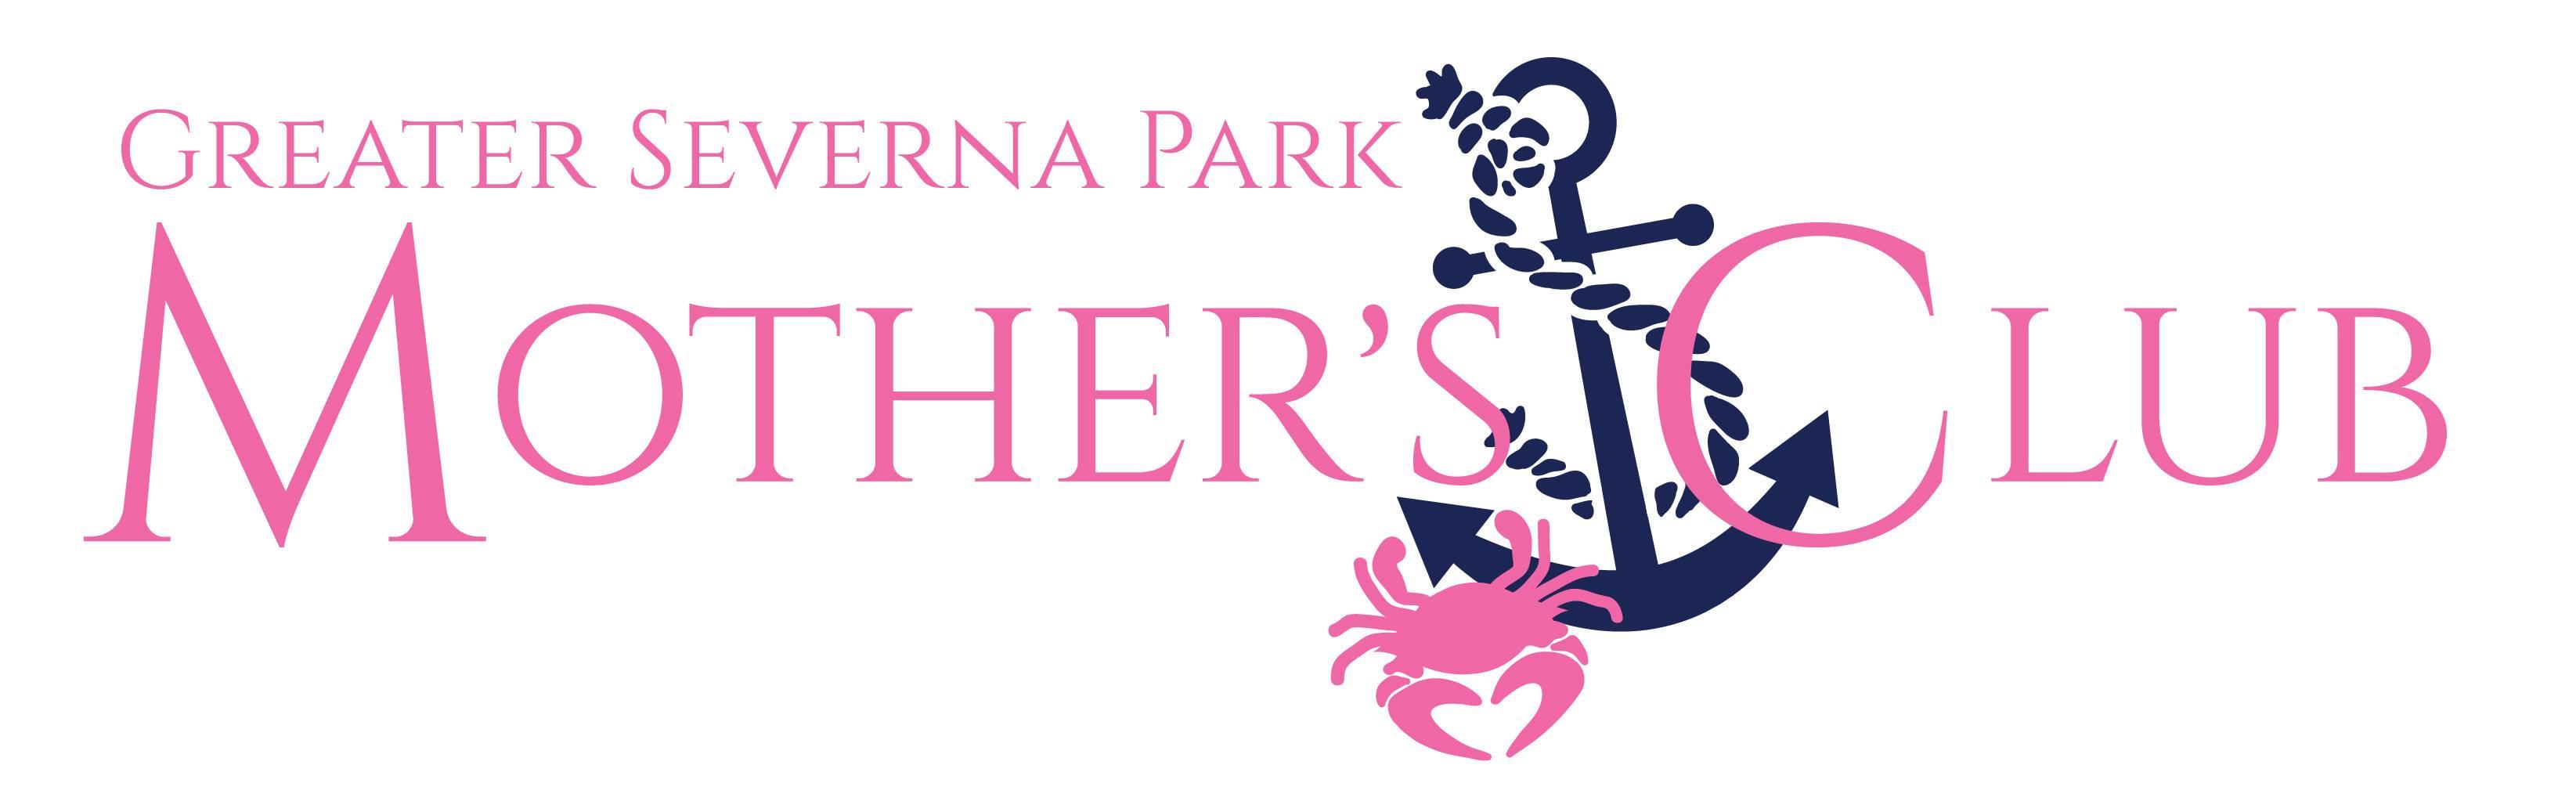 Holiday Girls Night Out 2017 Severna Park - Homestead Gardens, Inc ...